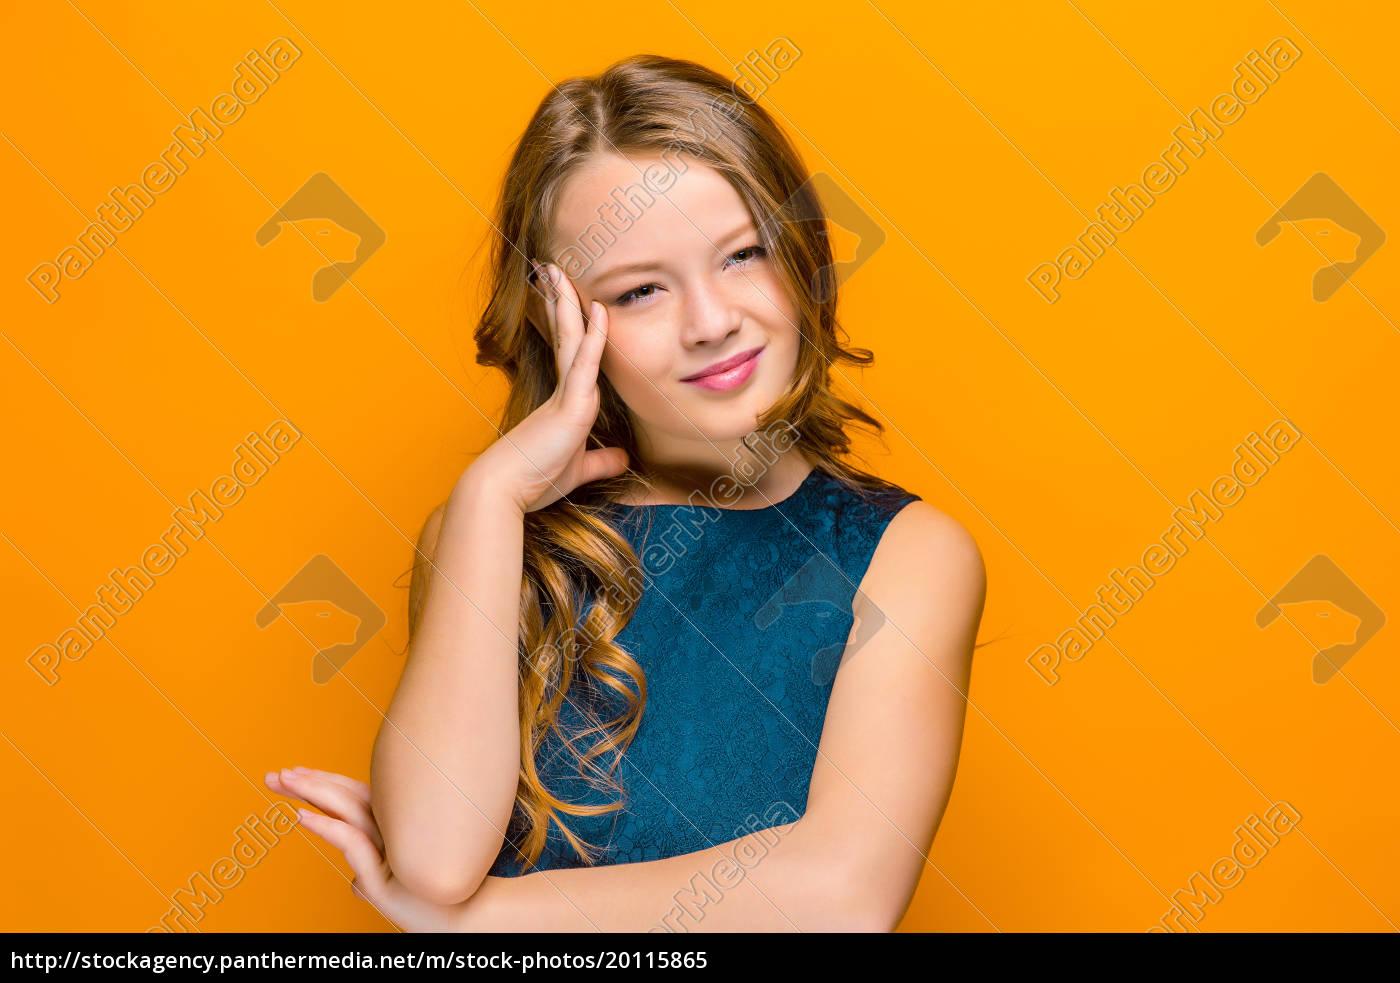 the, face, of, sad, teen, girl - 20115865